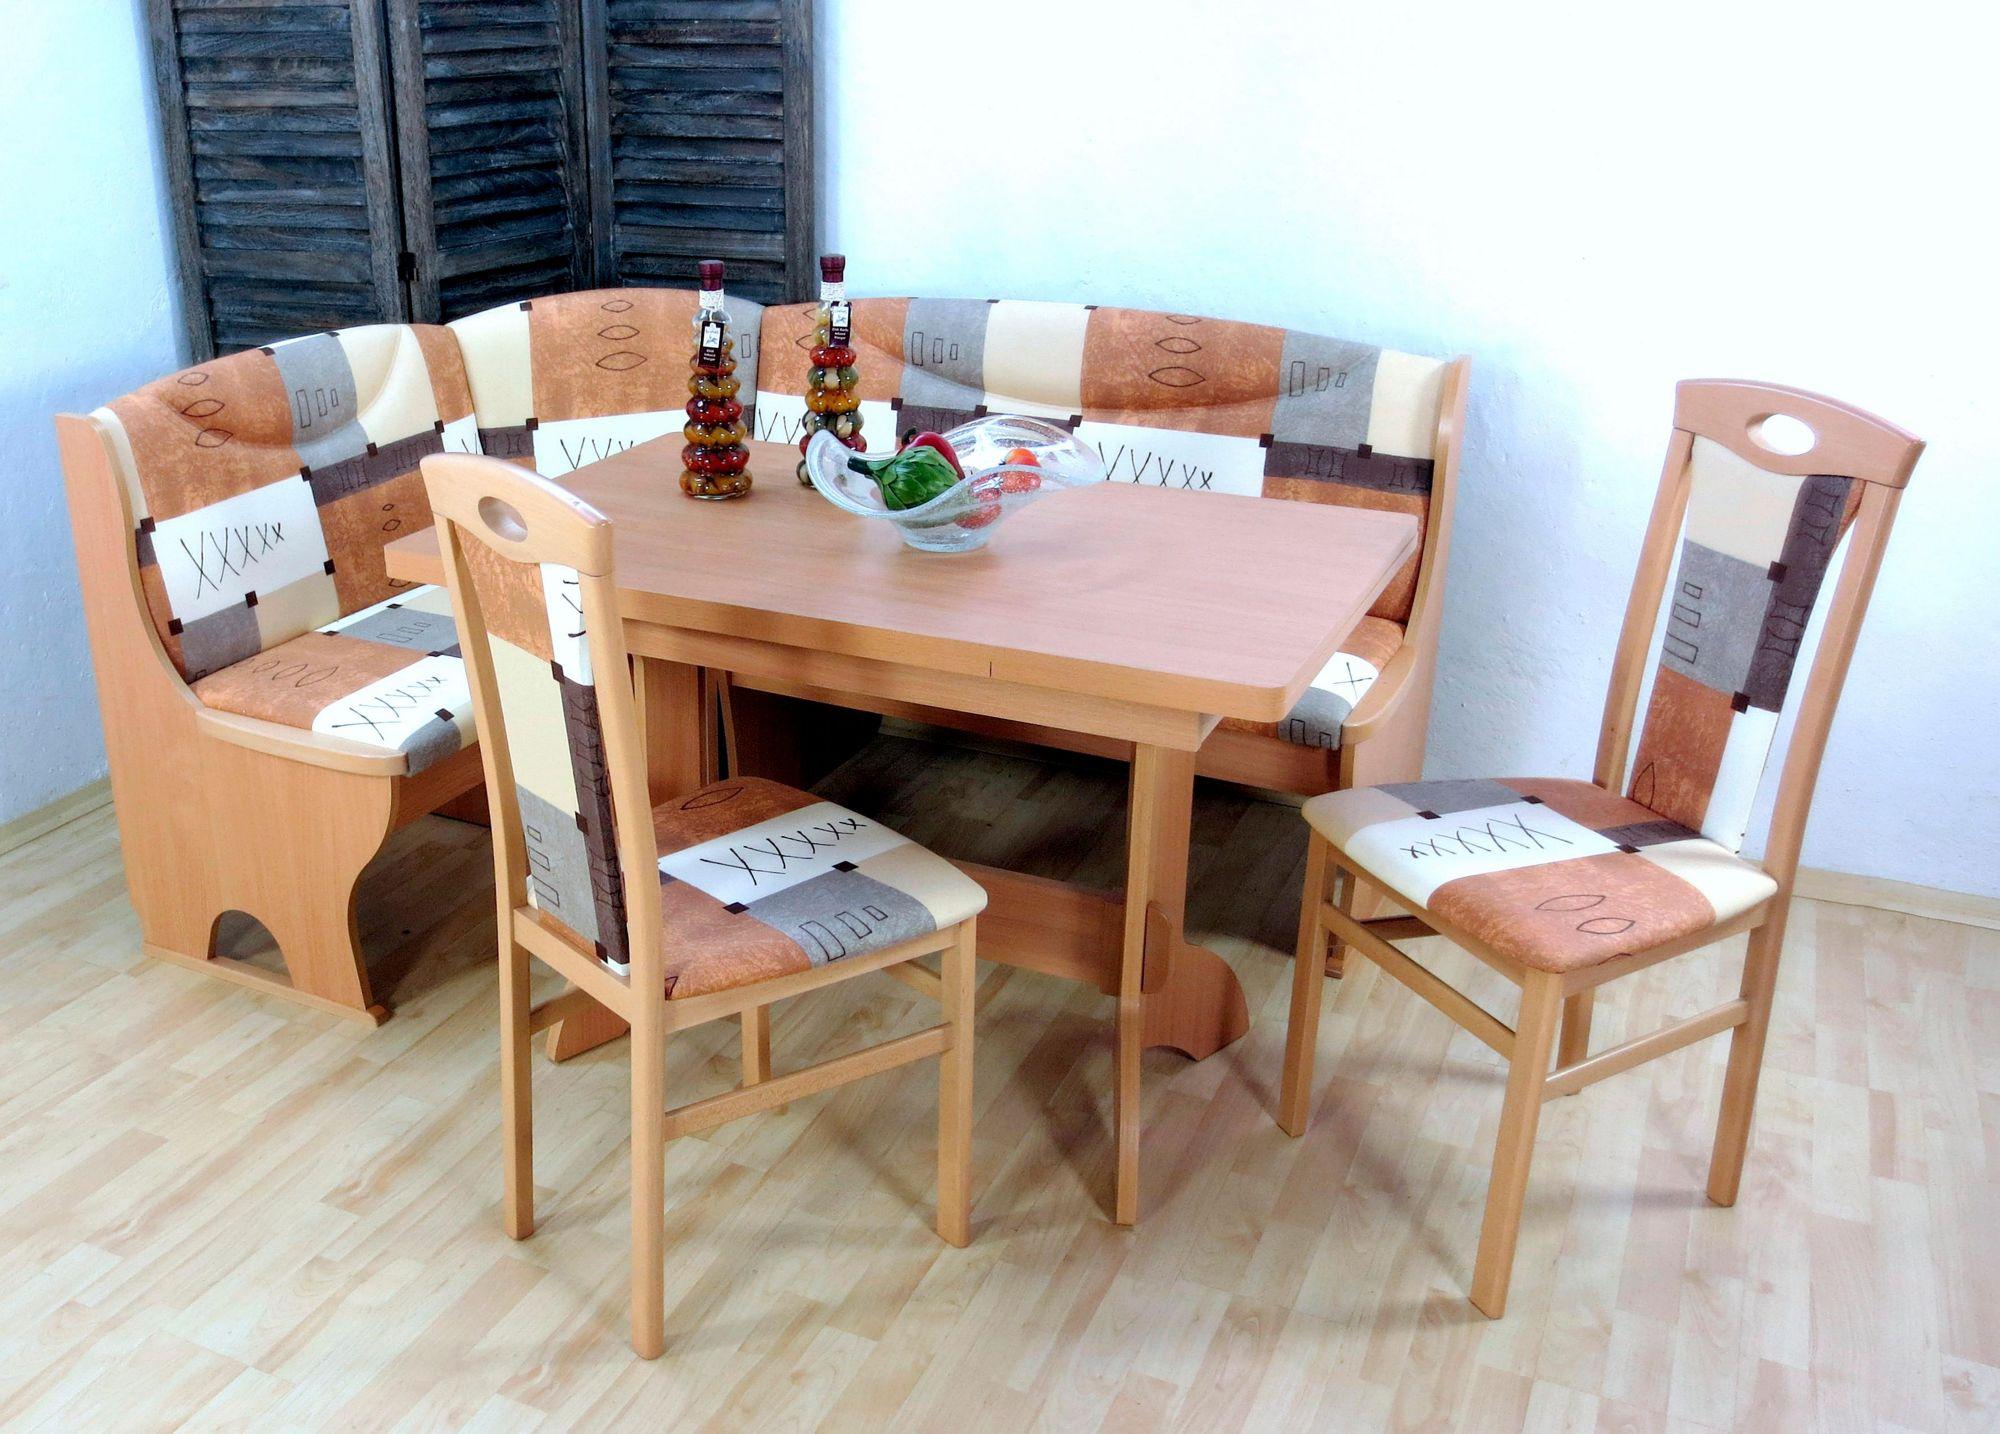 eckbankgruppe mit stauraum 4 teilig schwab versand eckbankgruppen. Black Bedroom Furniture Sets. Home Design Ideas